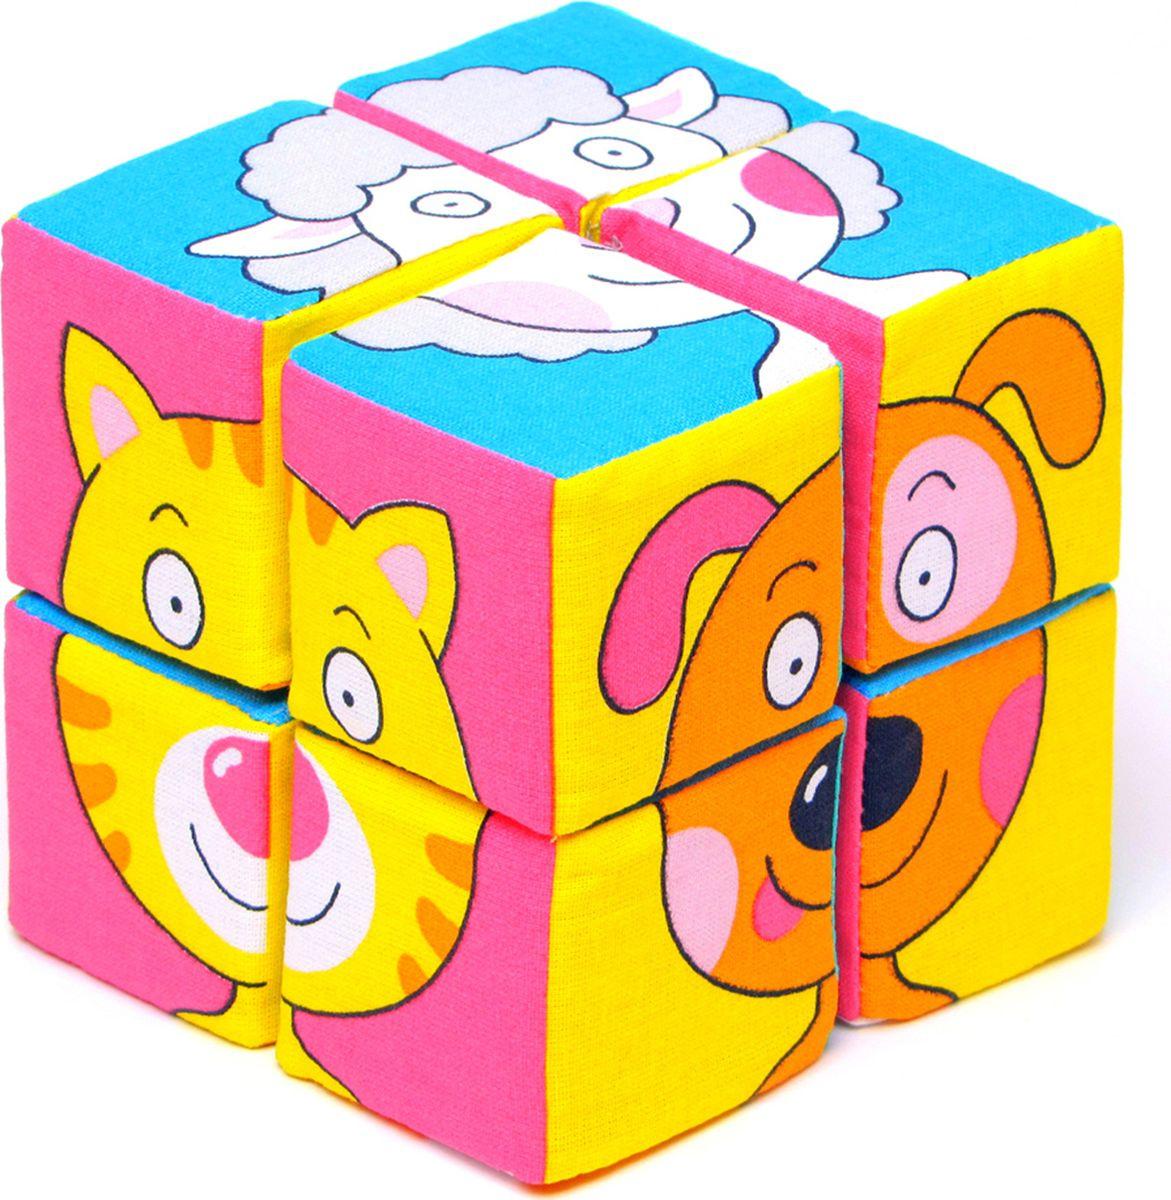 Мякиши мягкие кубики, Собери картинку: Зверята, 8 кубиков  #1